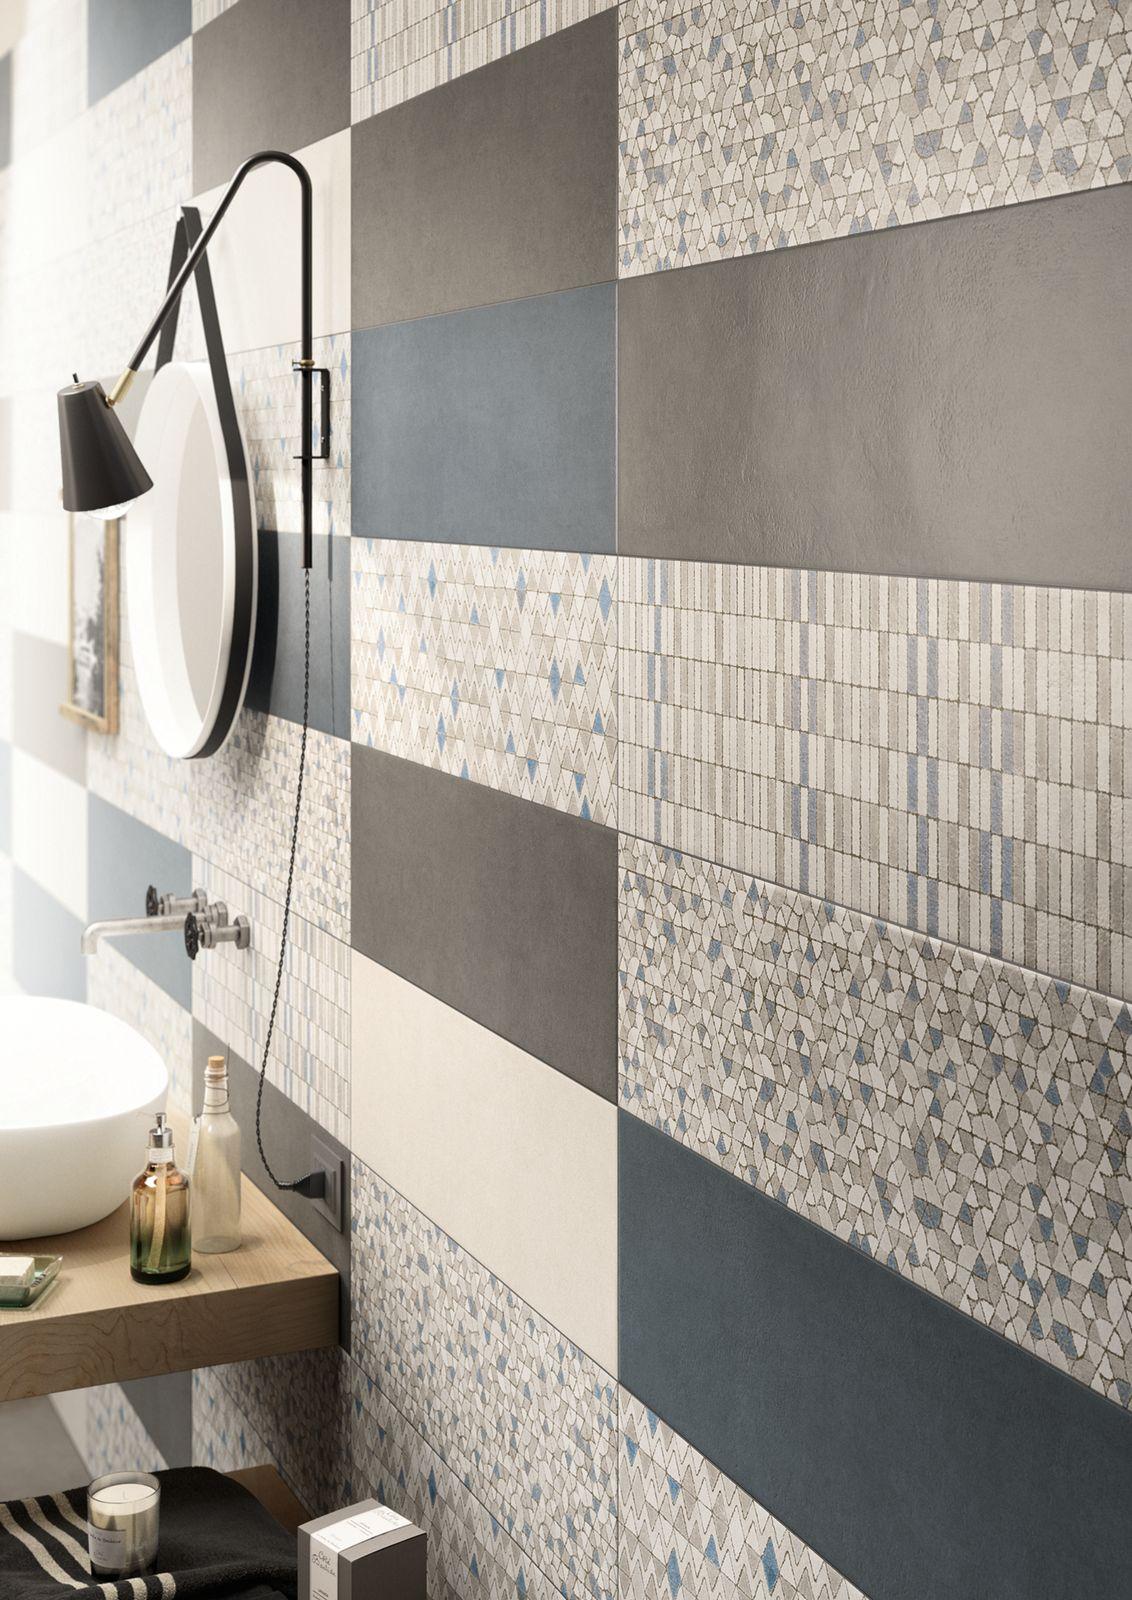 White paste wall floor tiles clayline by marazzi for Carrelage marazzi prix